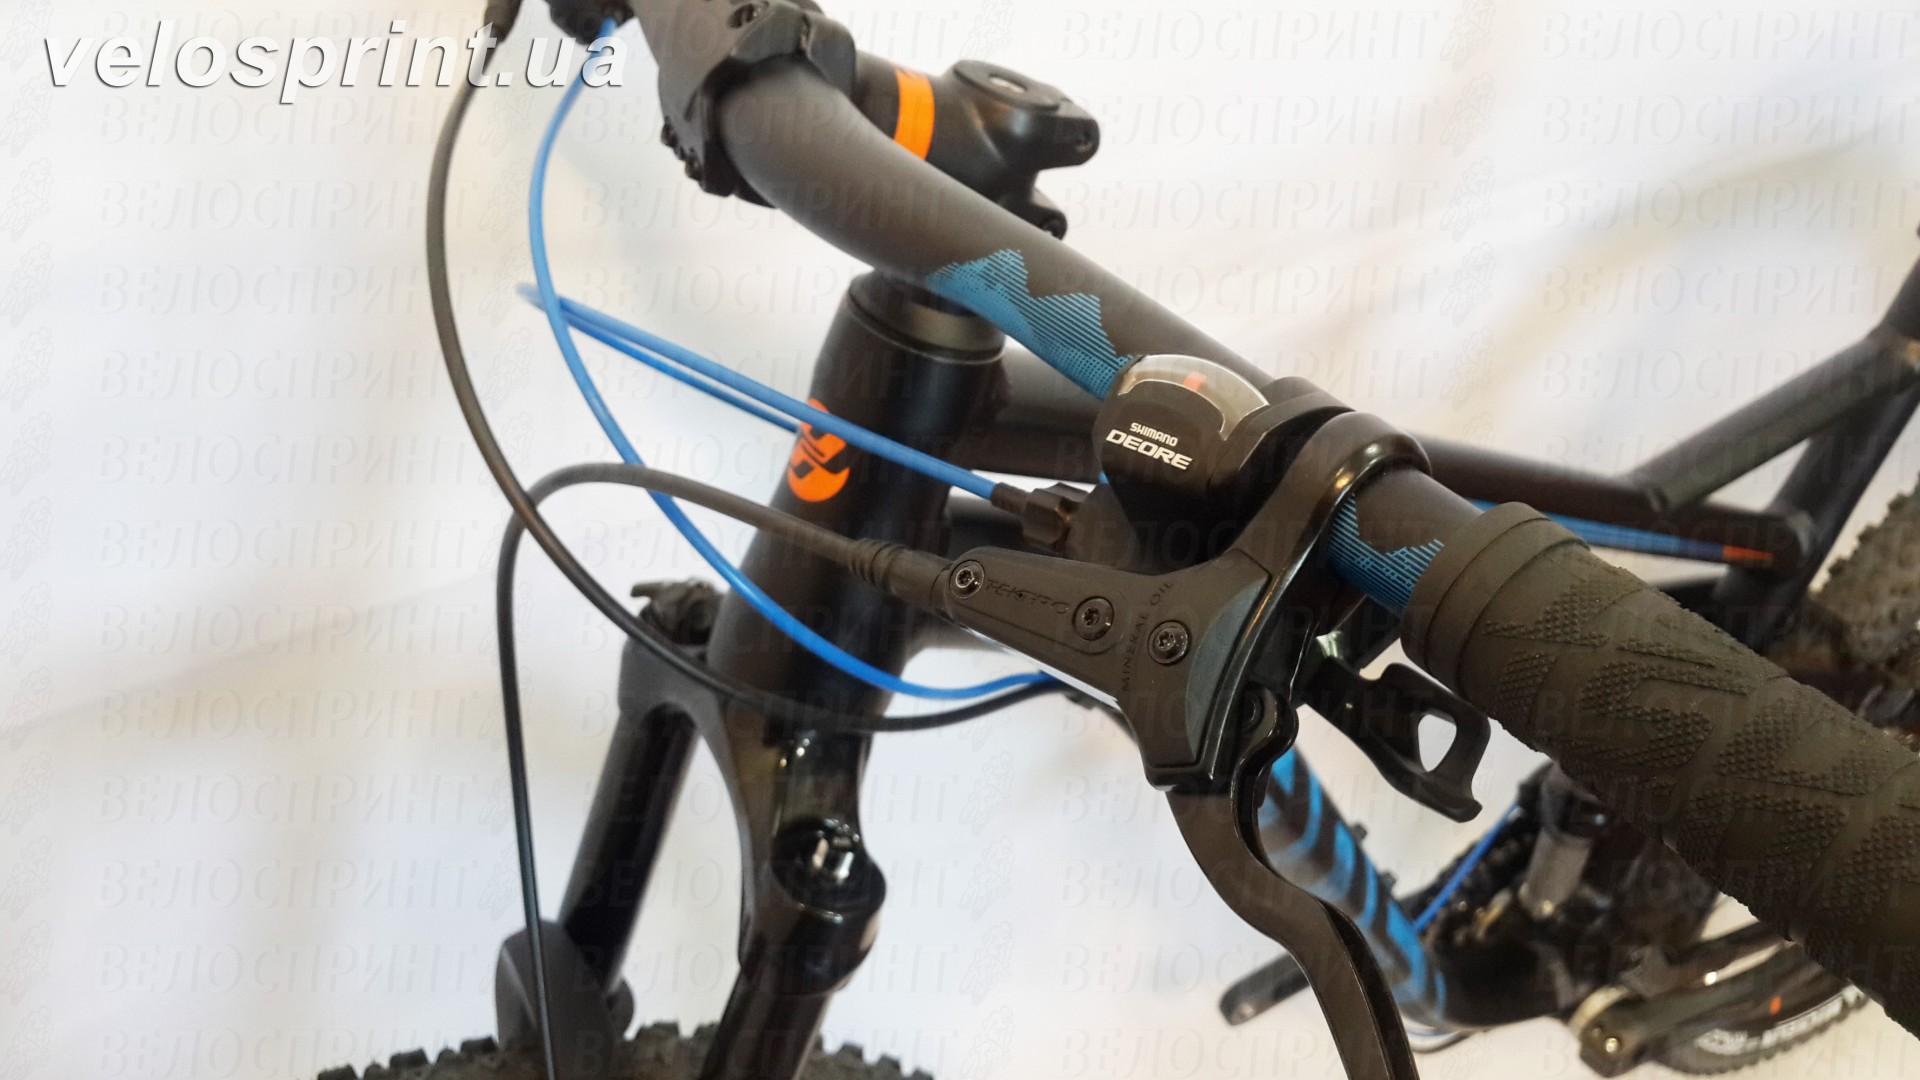 Велосипед GHOST Kato FS 2 AL 27.5 nightblack/riotblue/monarchorange руль год 2017